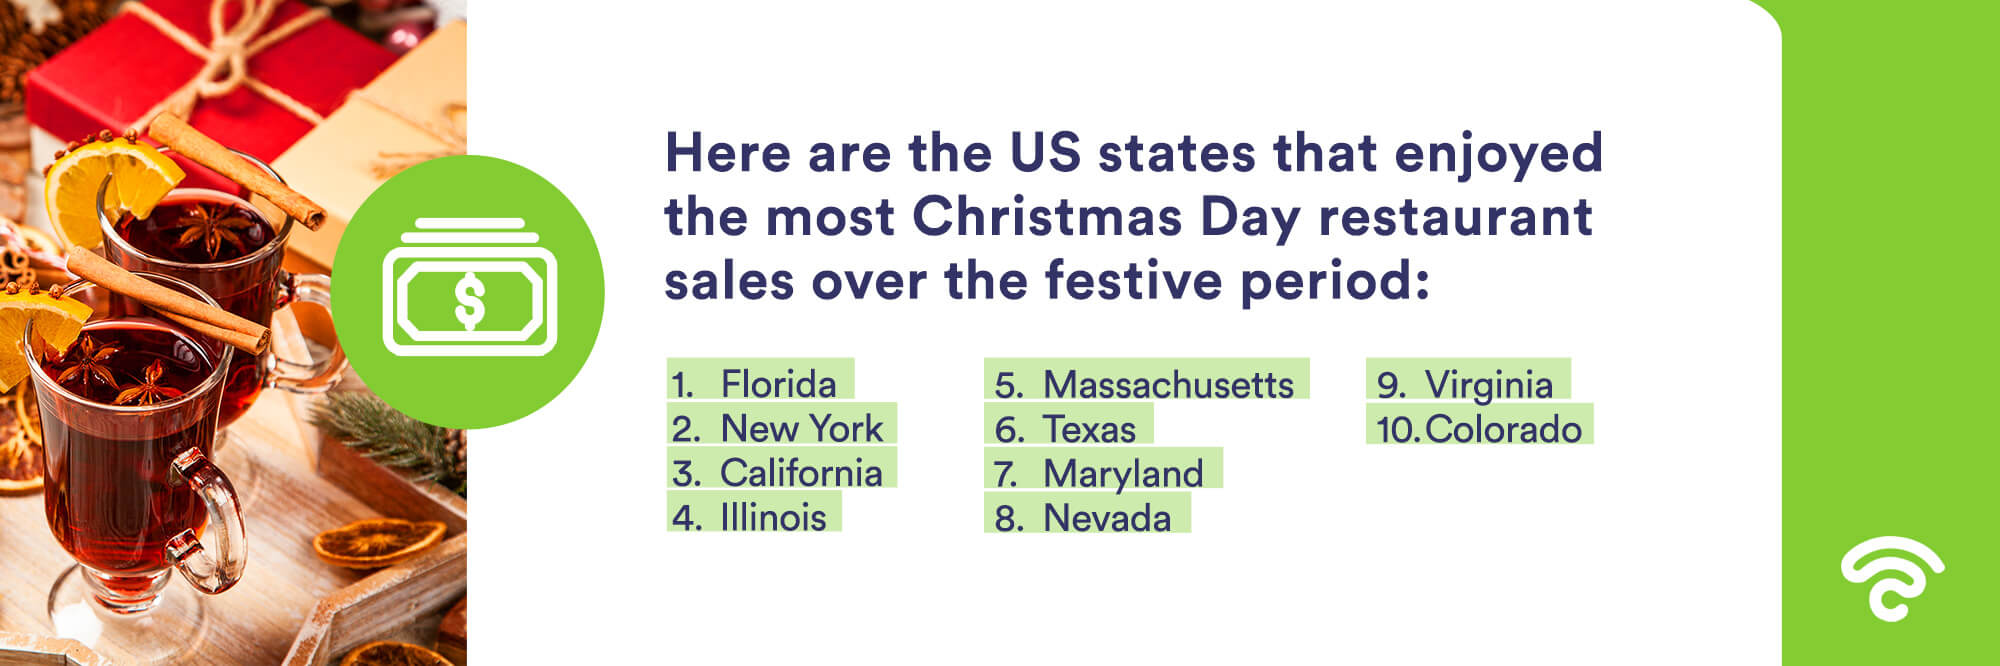 US states Christmas trade